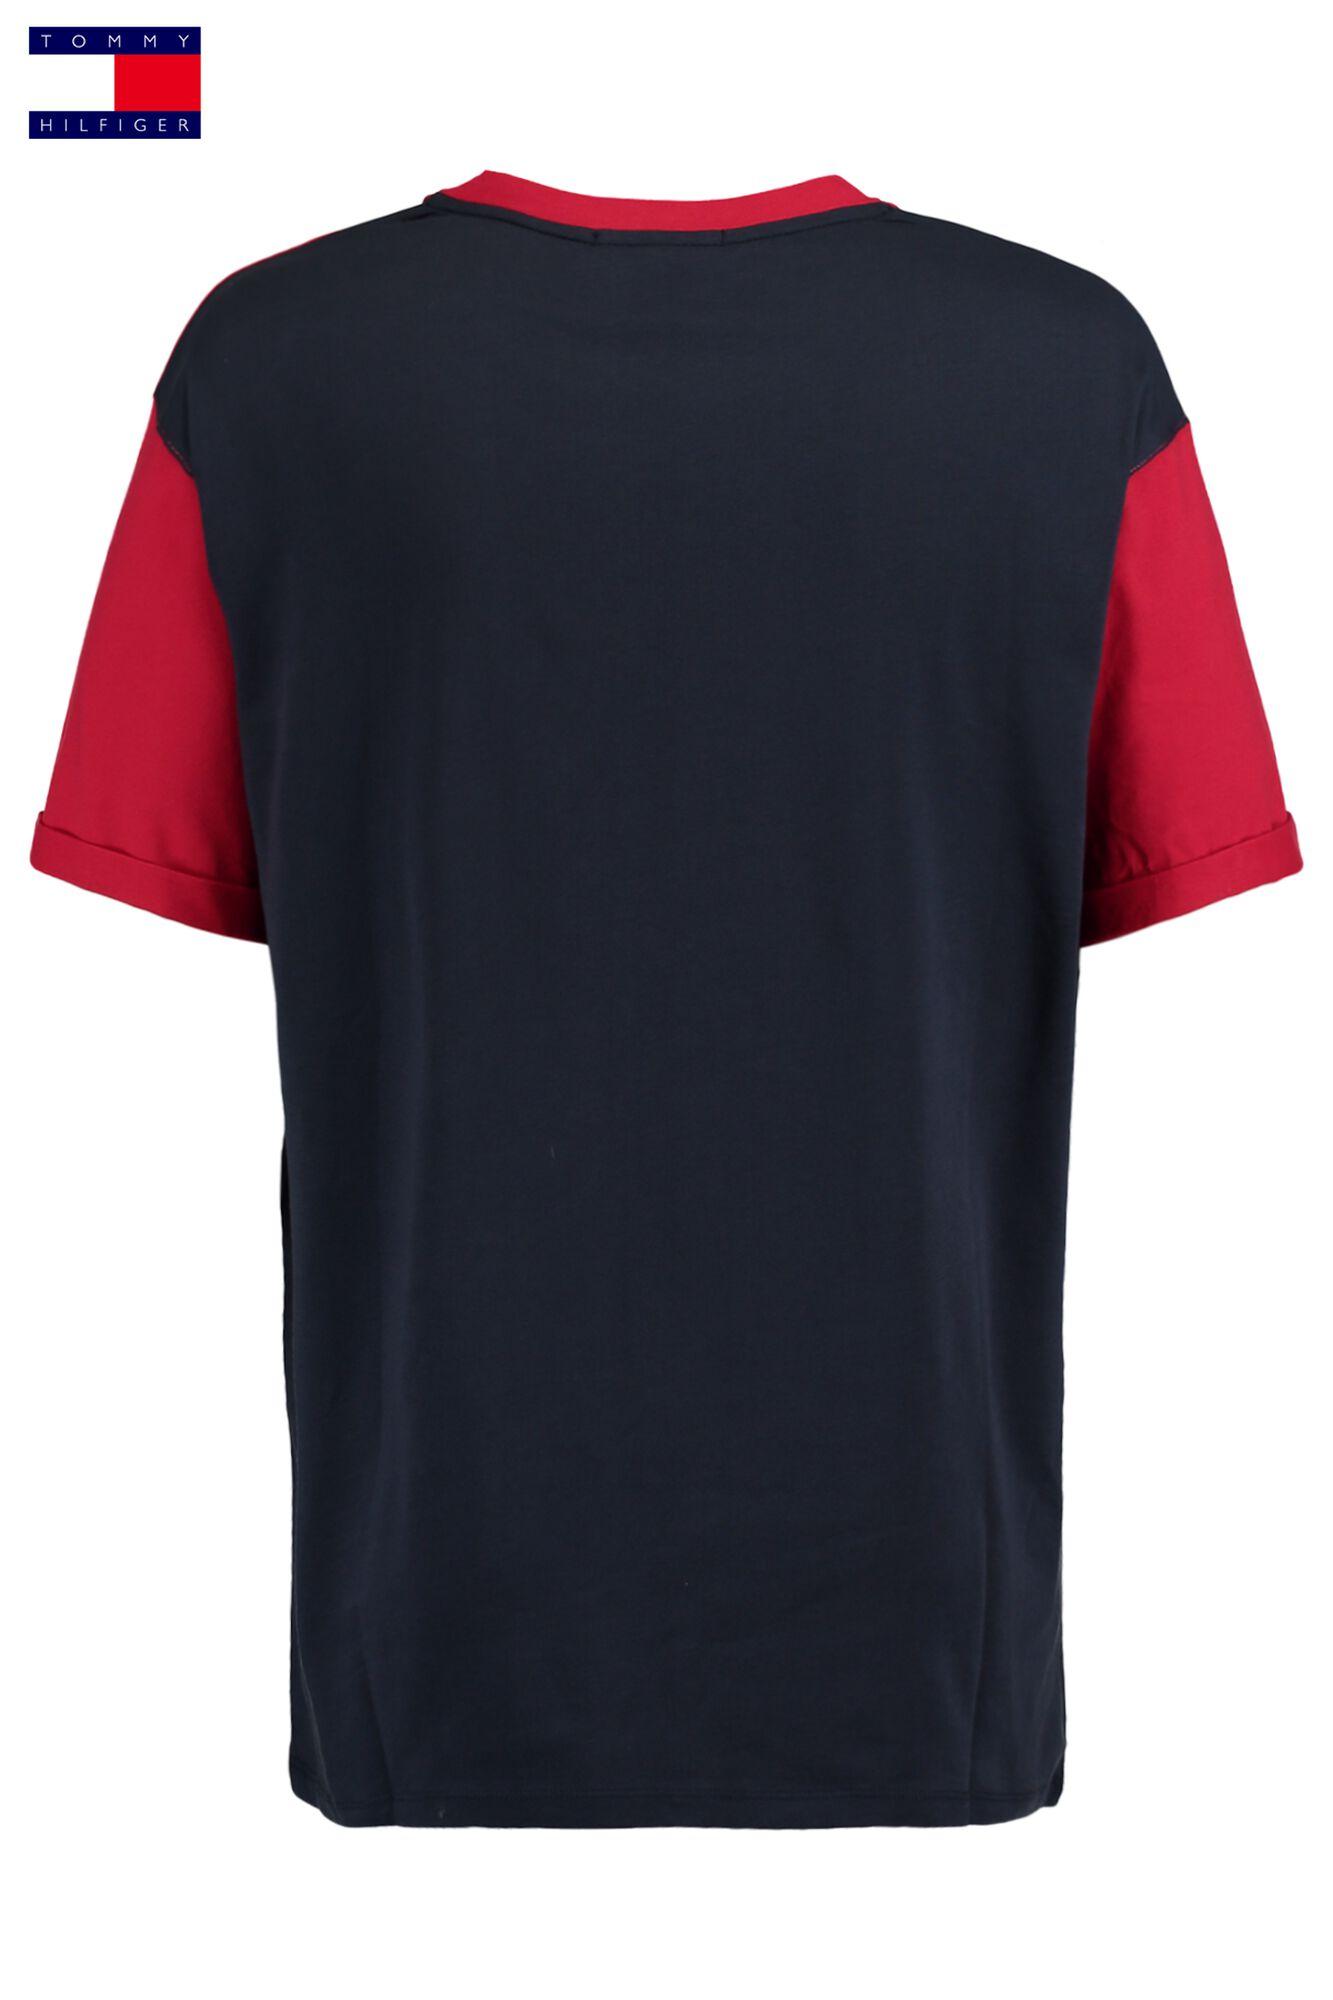 cae1b6fae Men T-shirt Tommy Hilfiger True tommy Red Buy Online